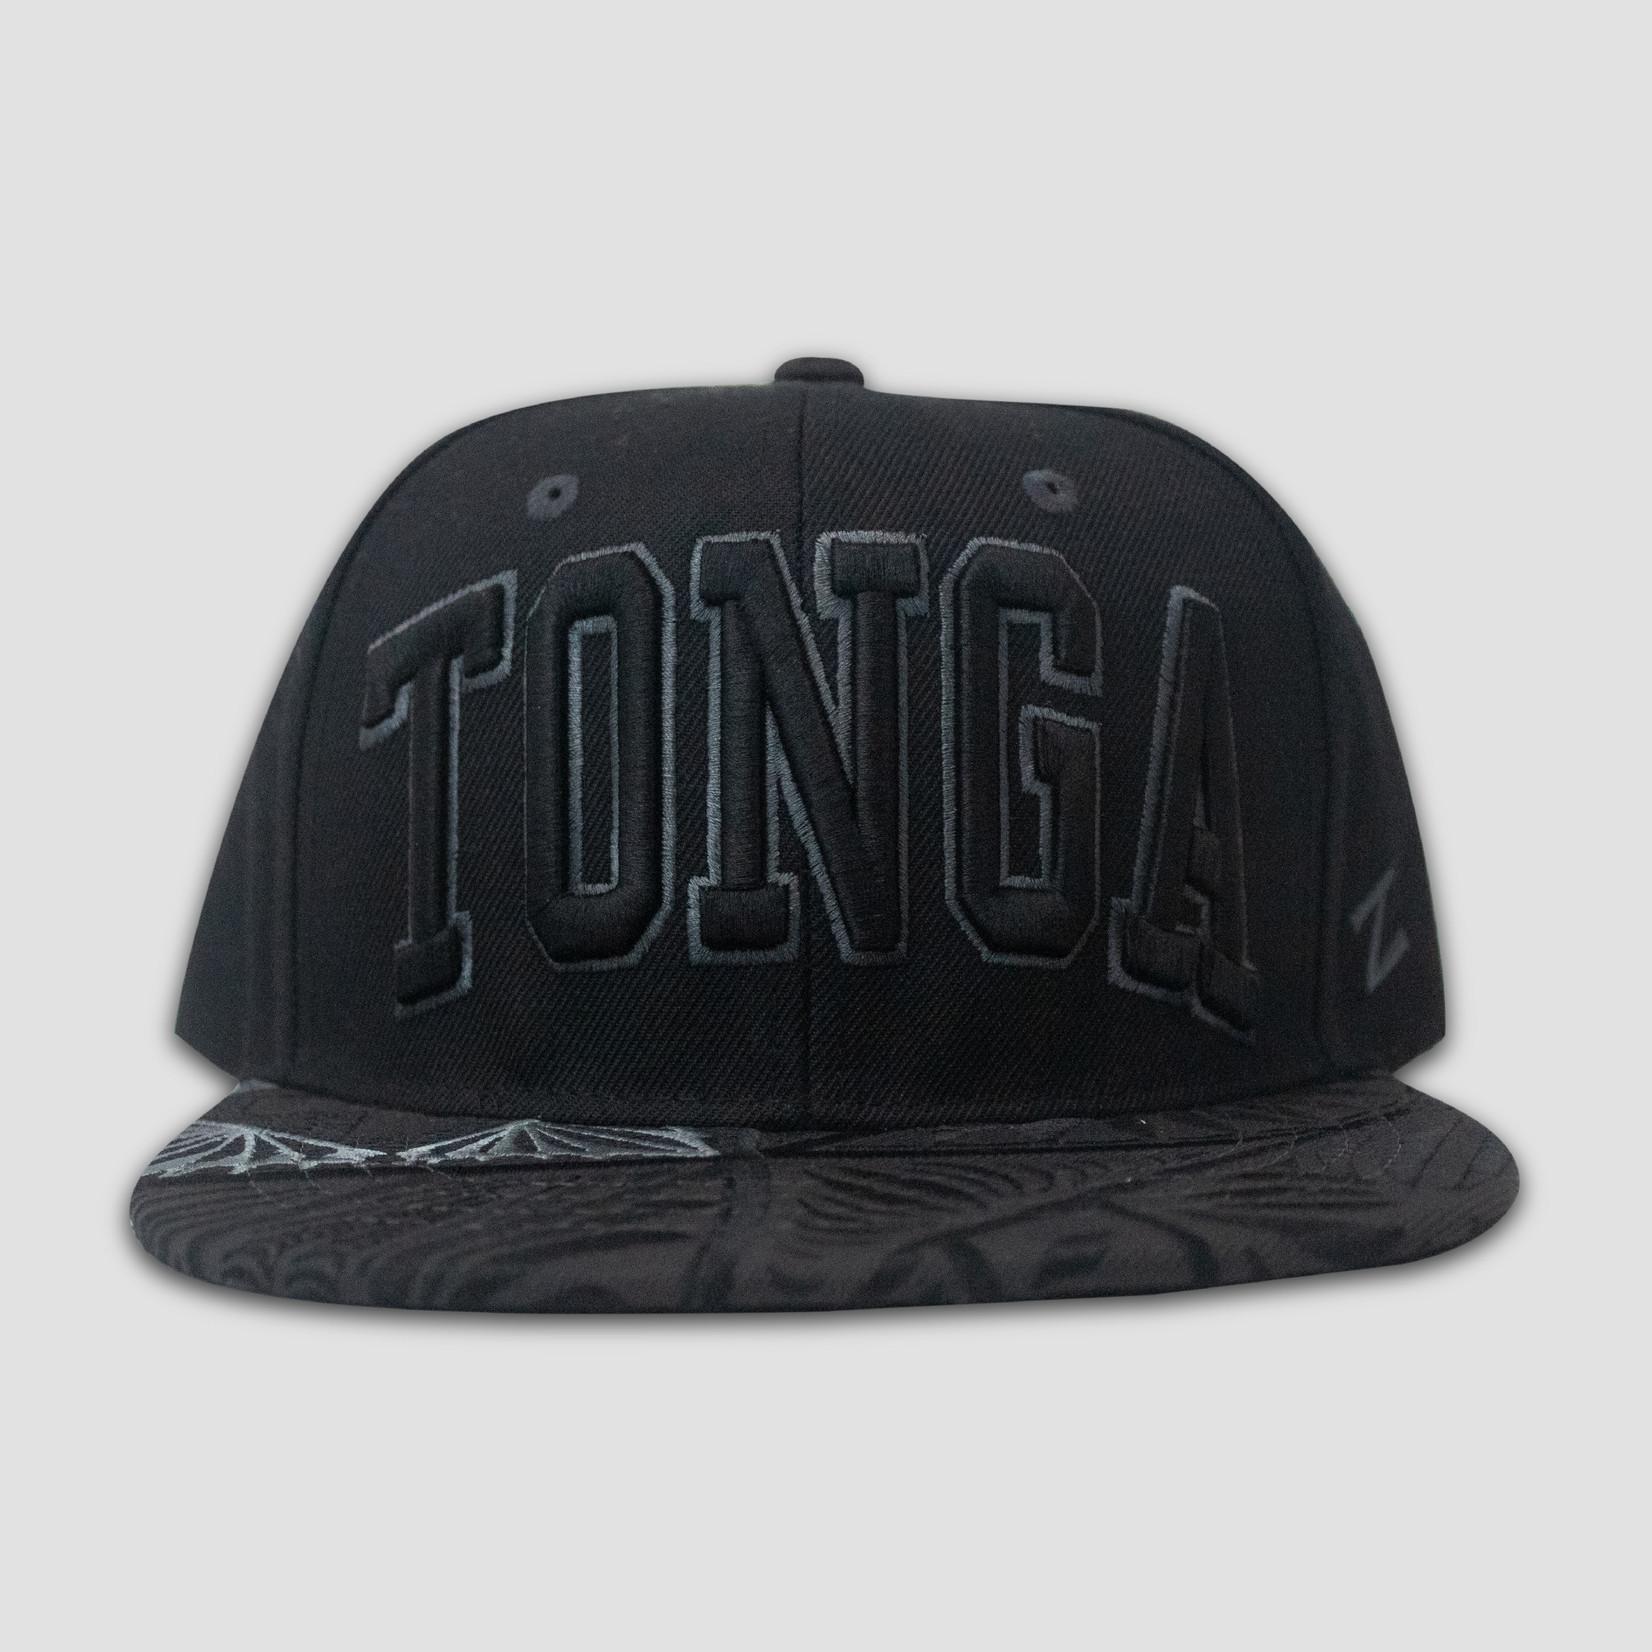 ZEPHYR Zephyr Tonga Superstar All Black